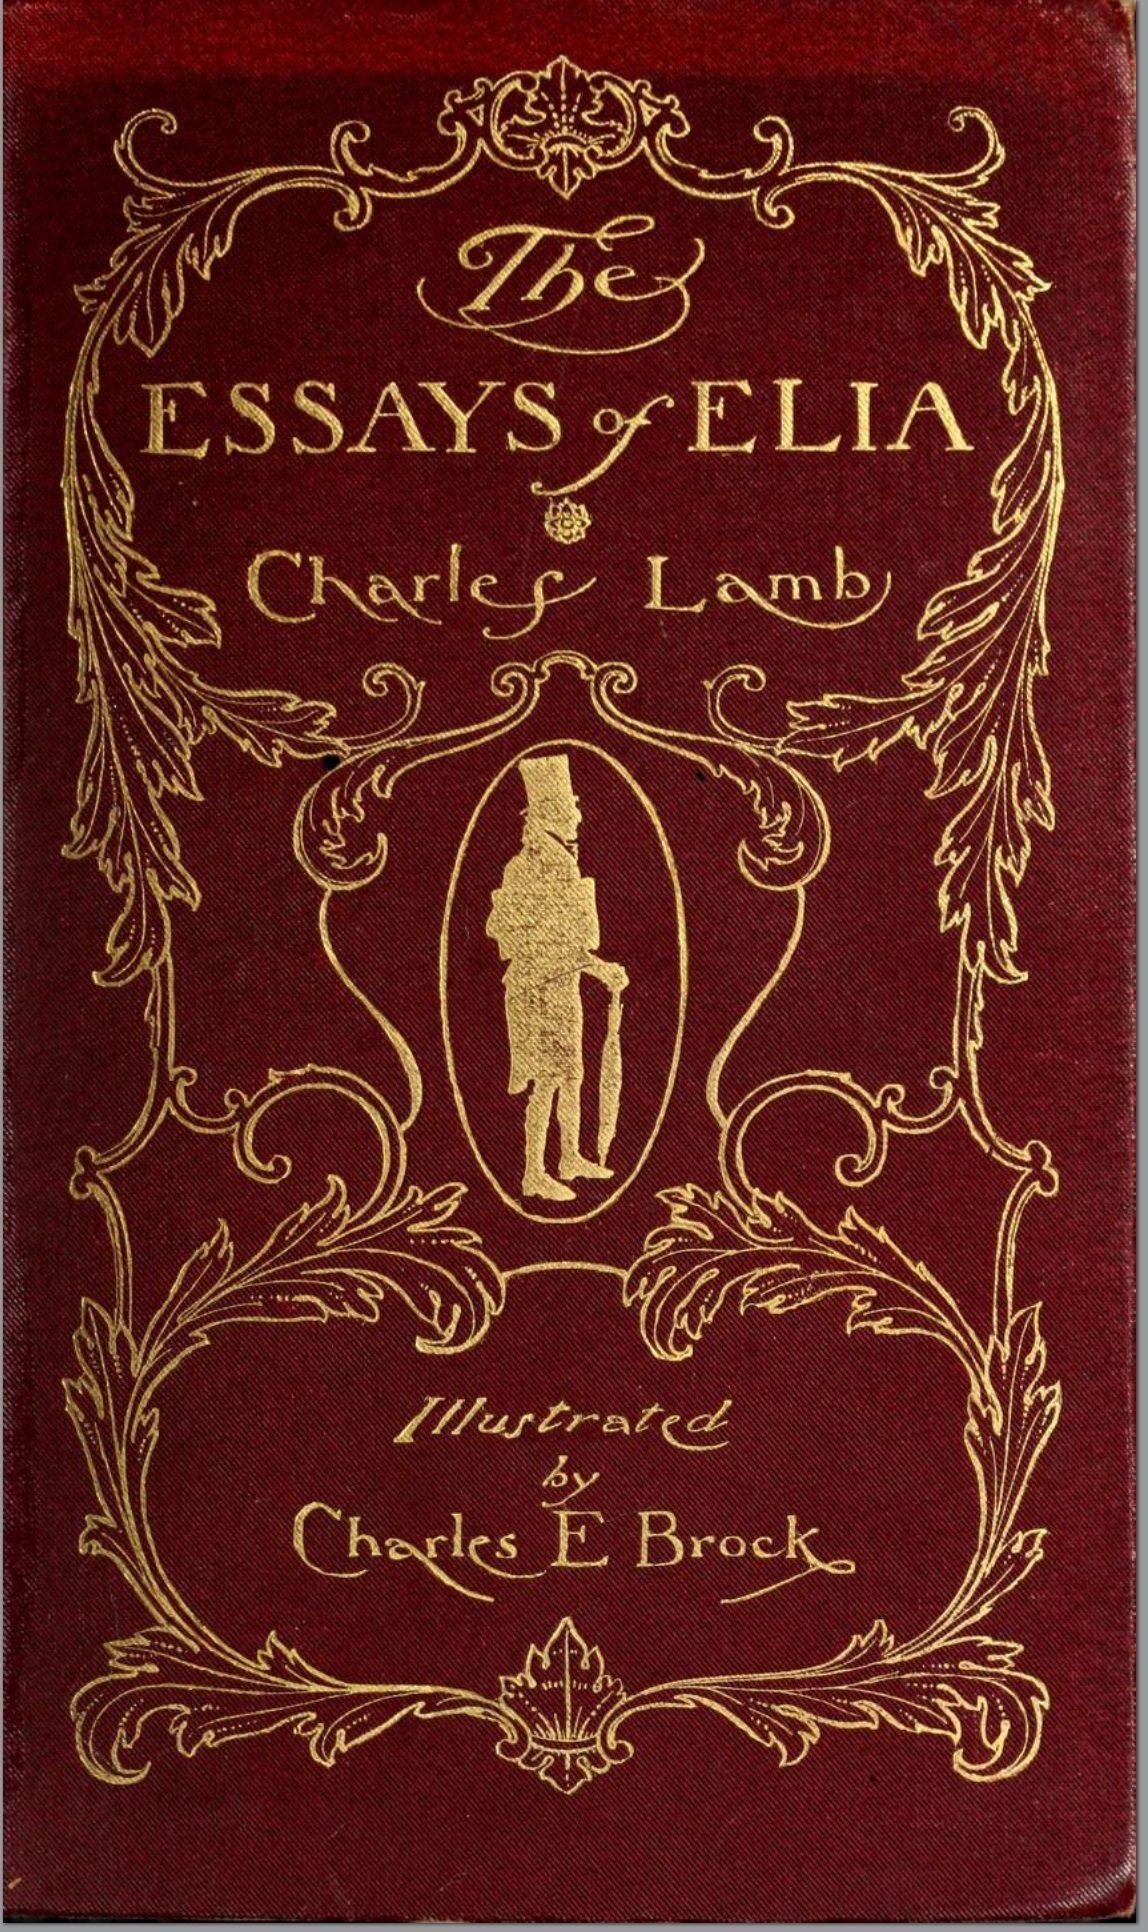 The Essays Of Elia Charles Lamb 1900